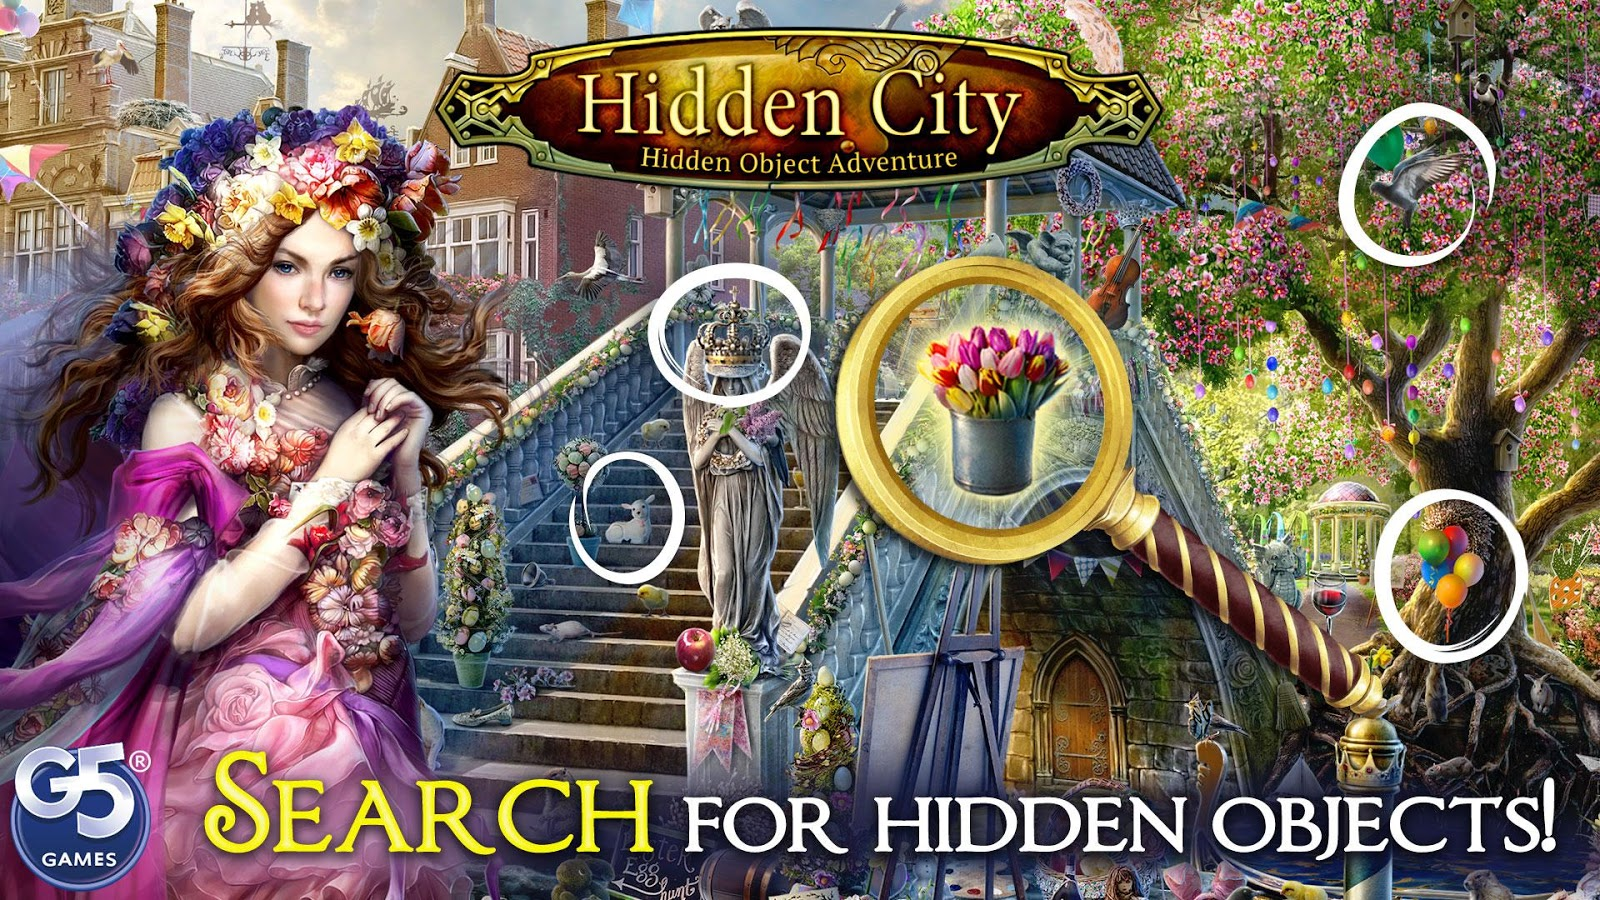 Spiel Hidden City